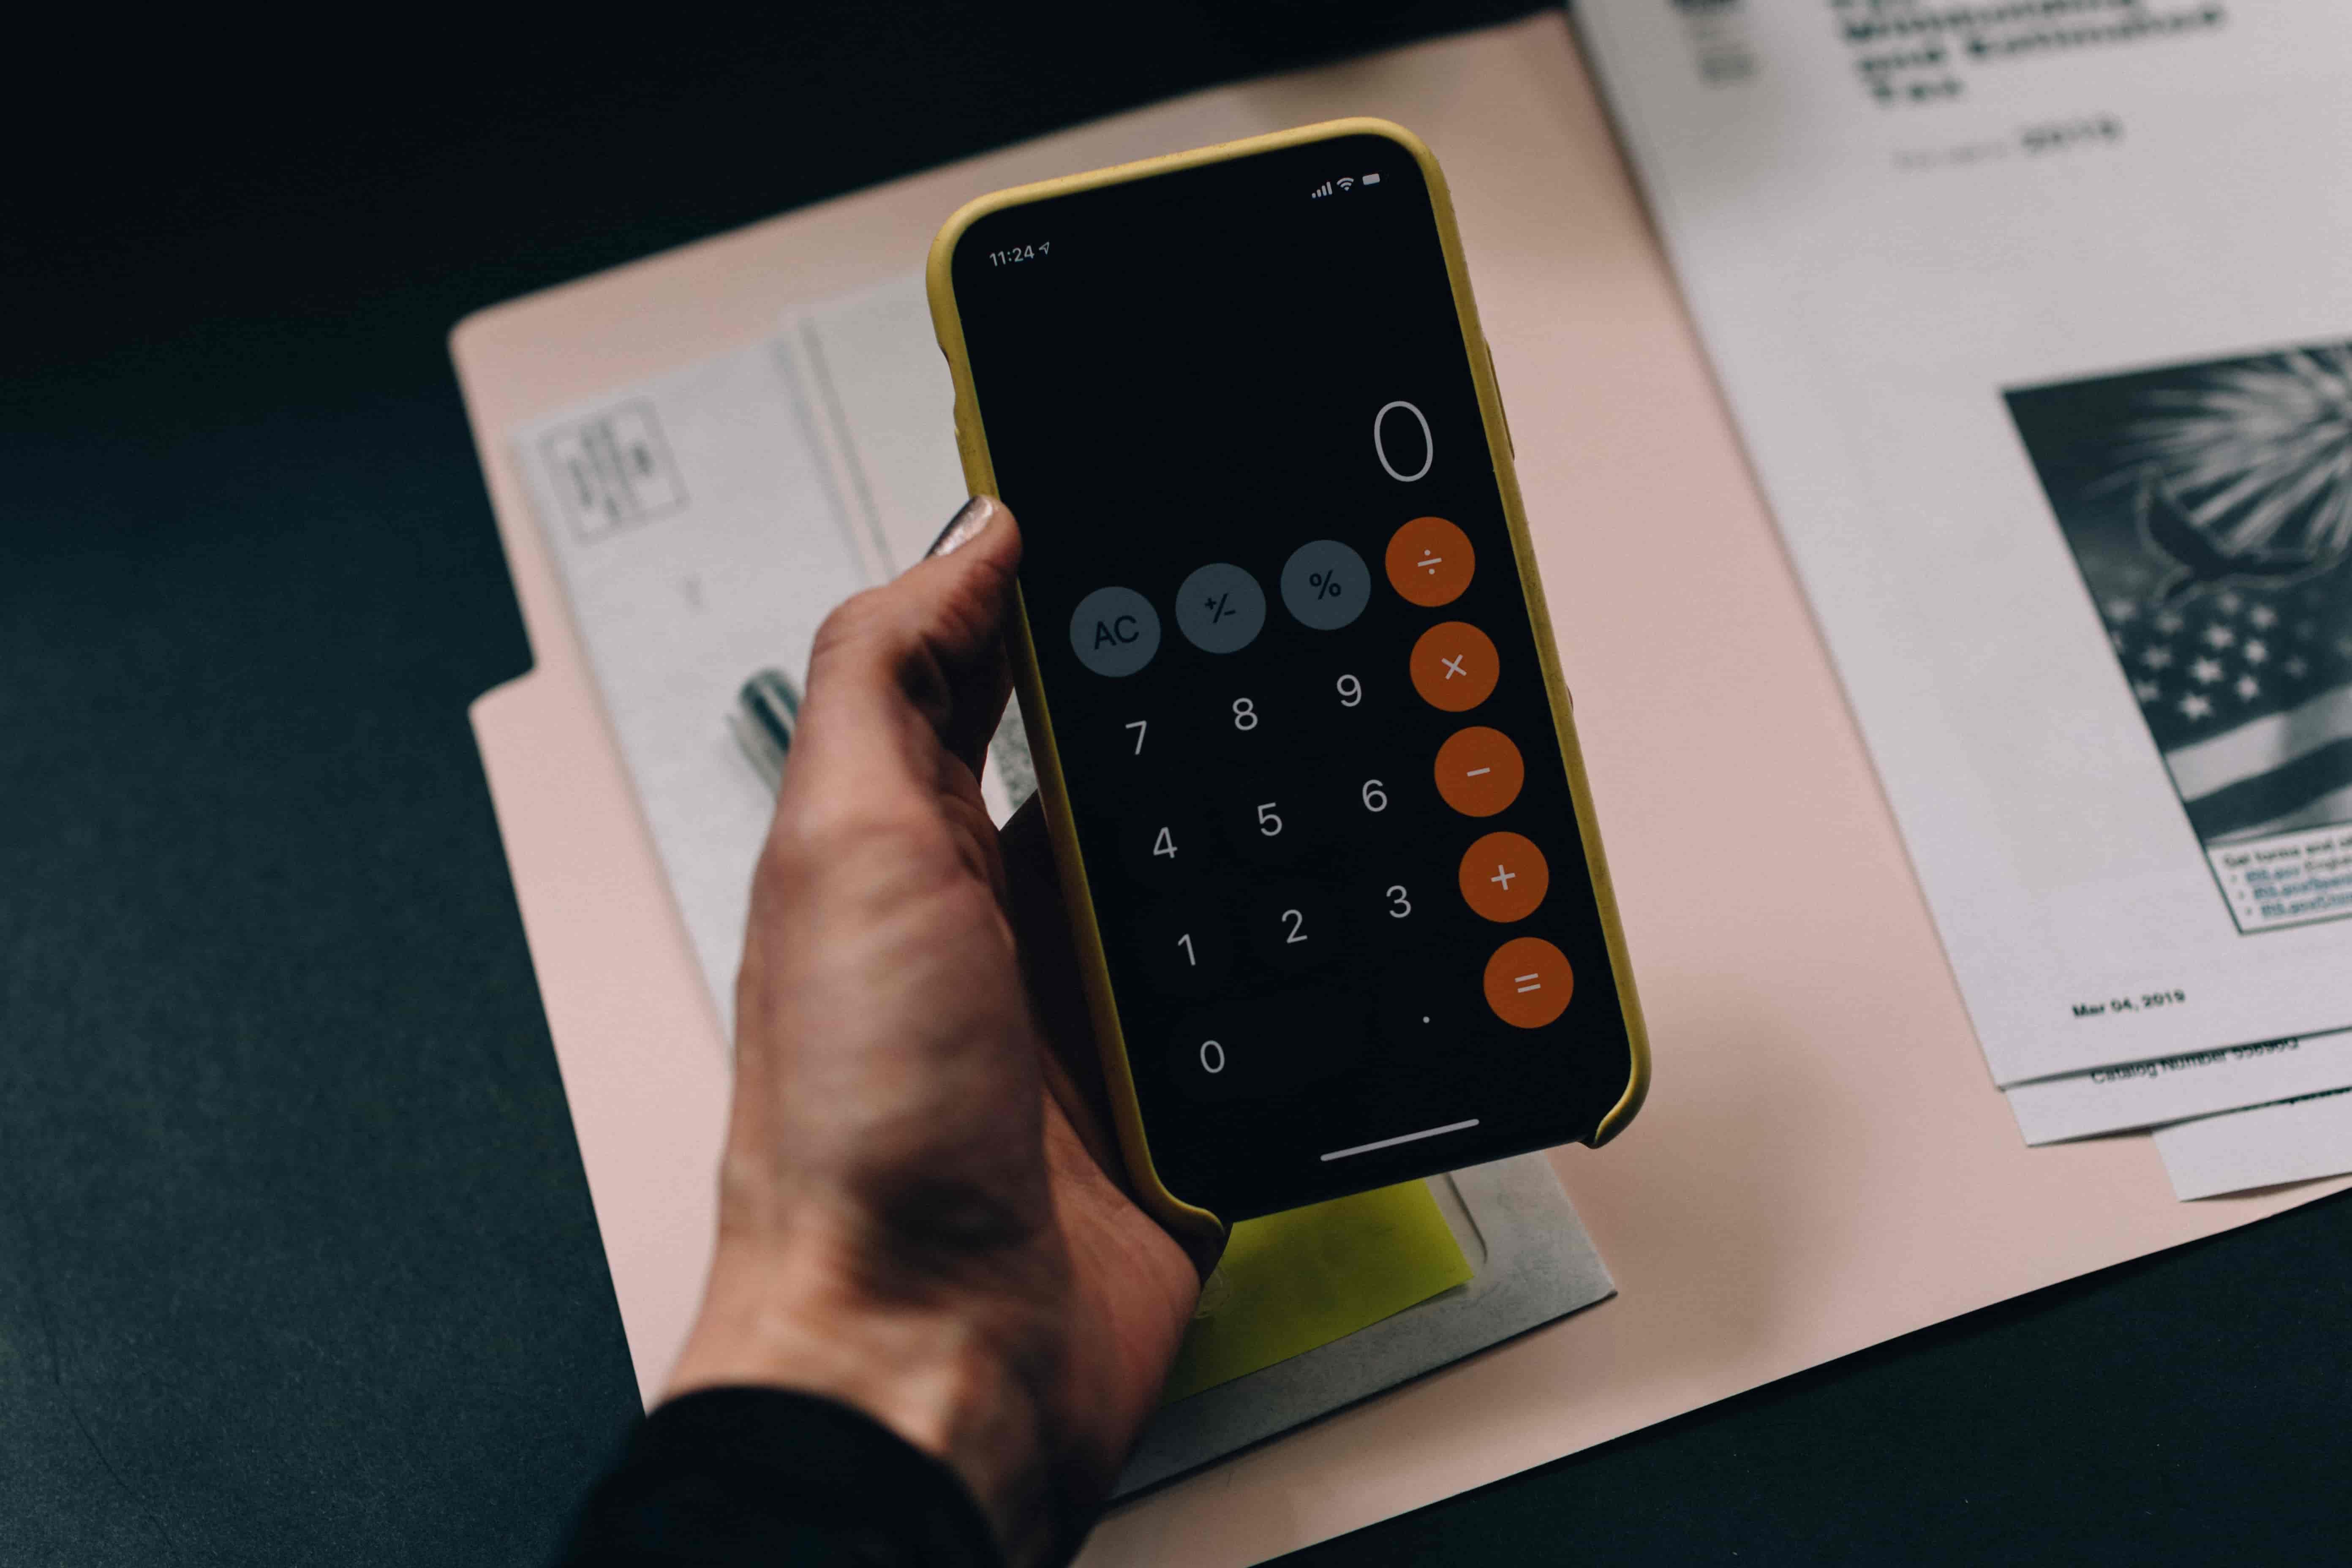 Comment calculer les frais réels ? 2021 - Okarito